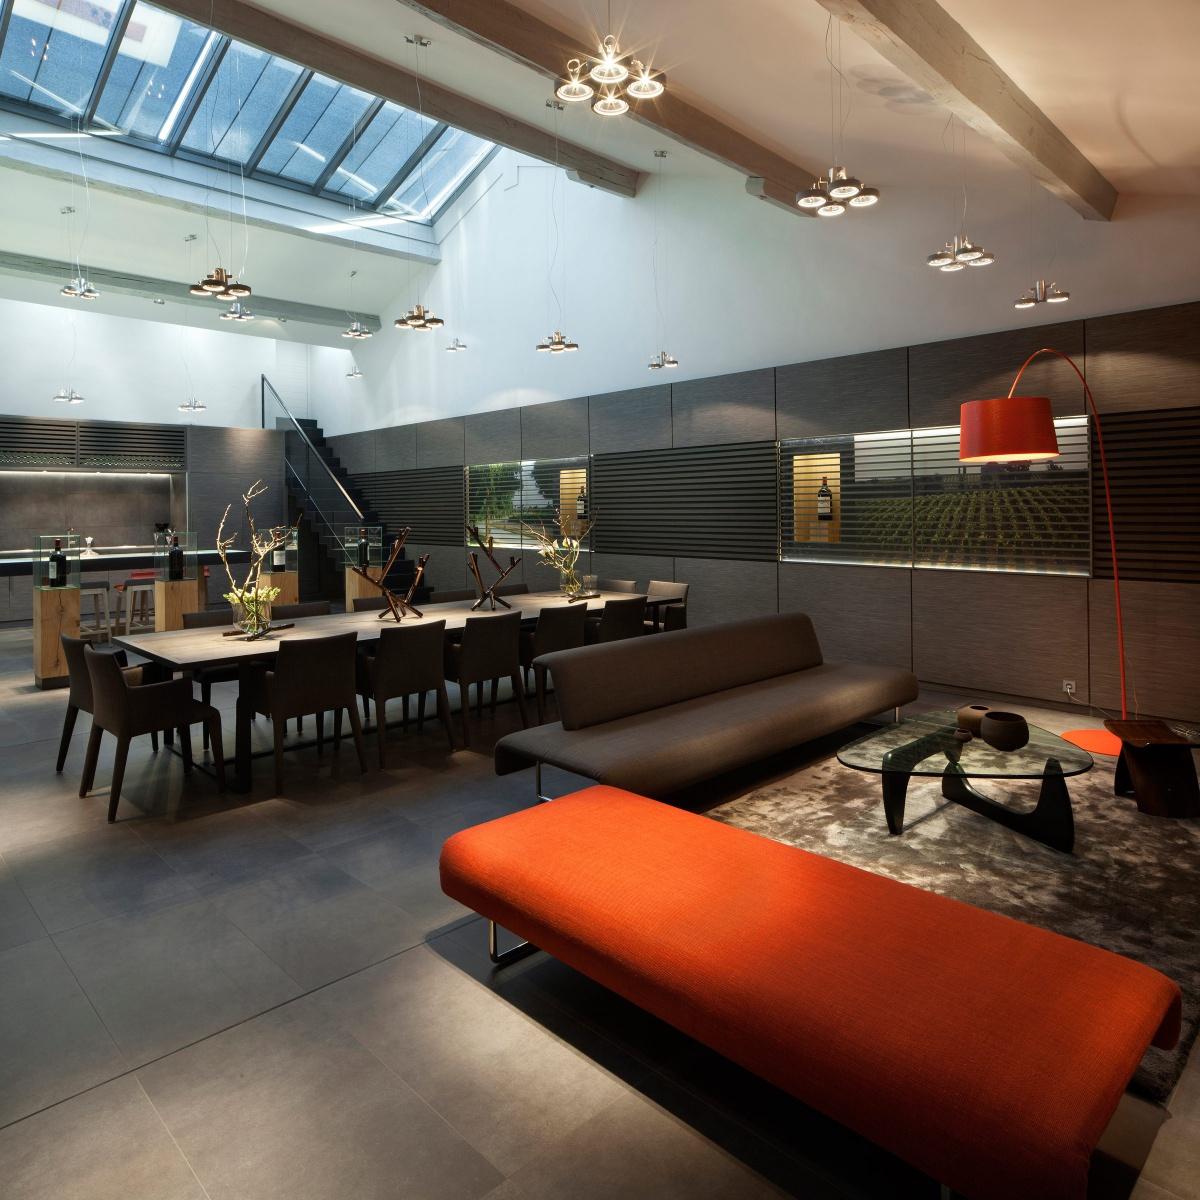 laurens peggy fda f d ration des designers en aquitaine. Black Bedroom Furniture Sets. Home Design Ideas